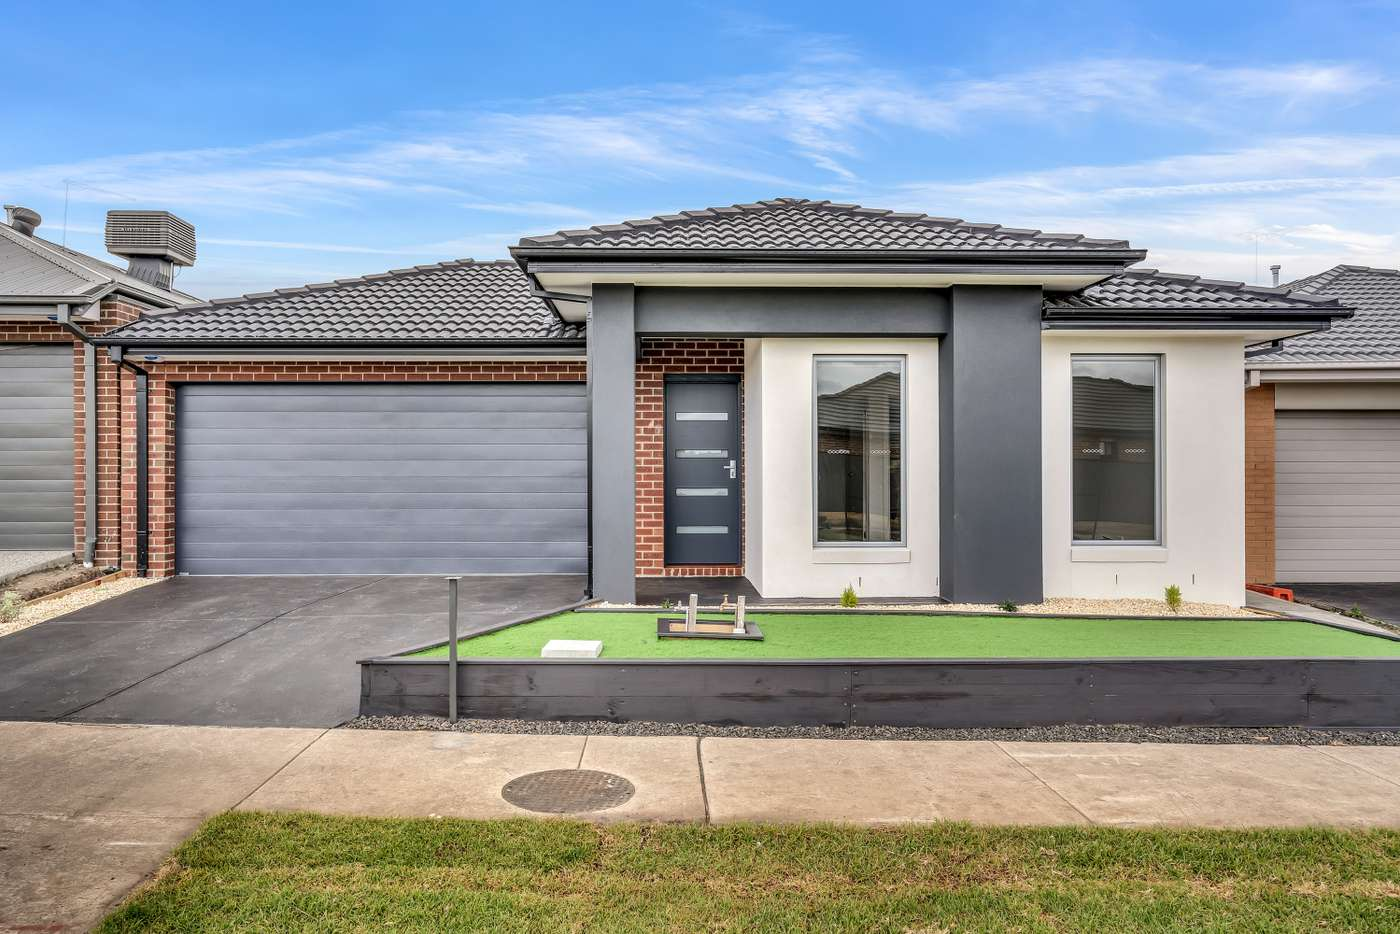 Main view of Homely house listing, 6 Erasmus Avenue, Craigieburn VIC 3064